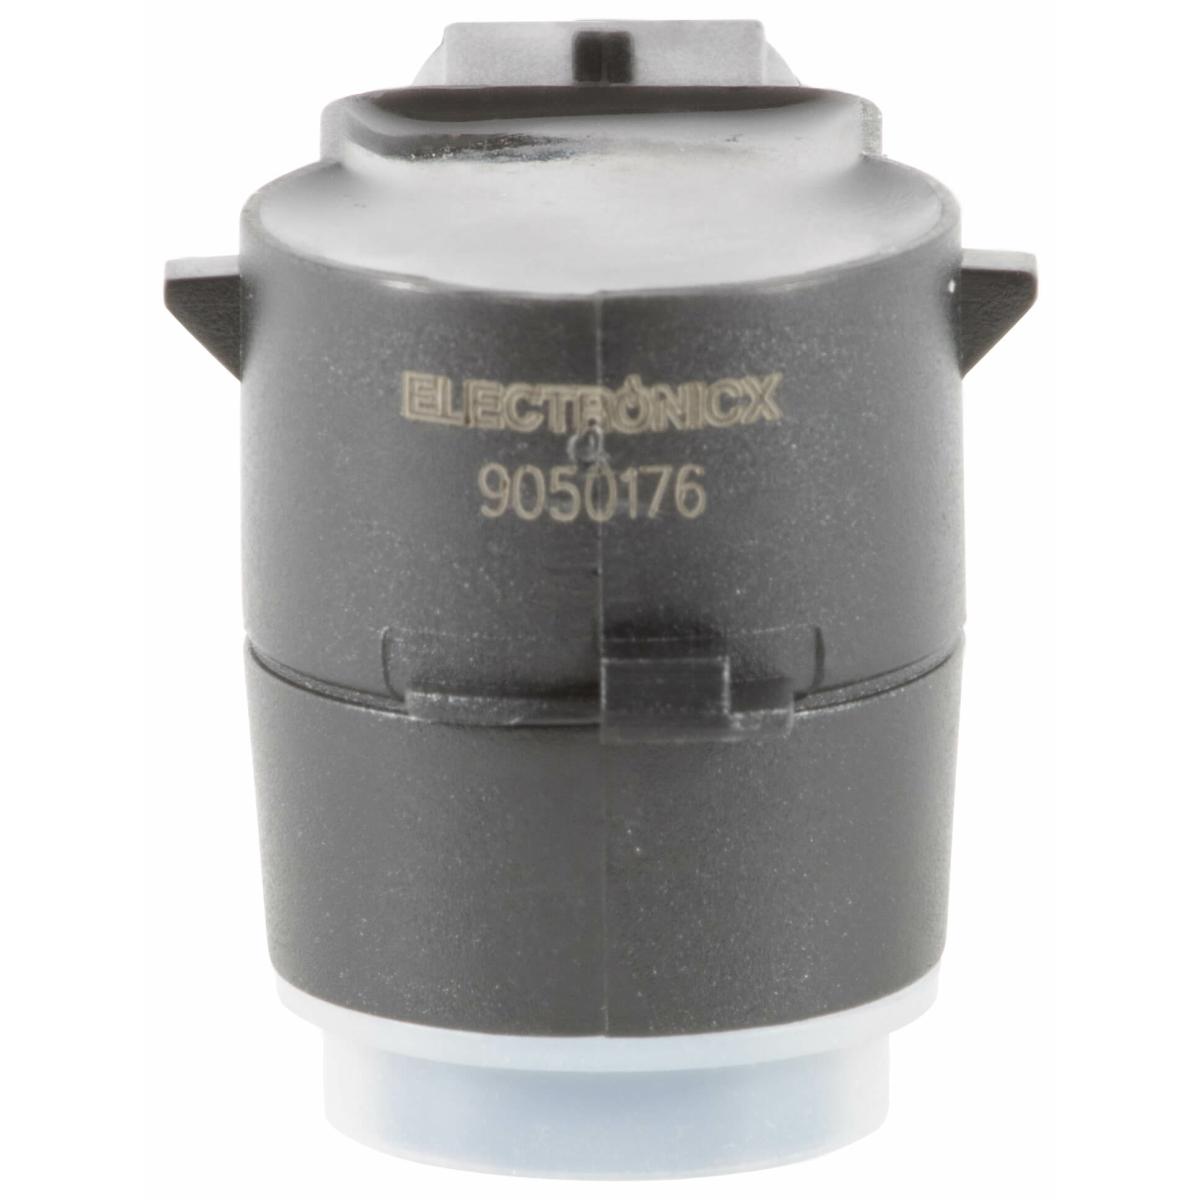 Park sensor 9050176 for Cadillac PDC Parktronic